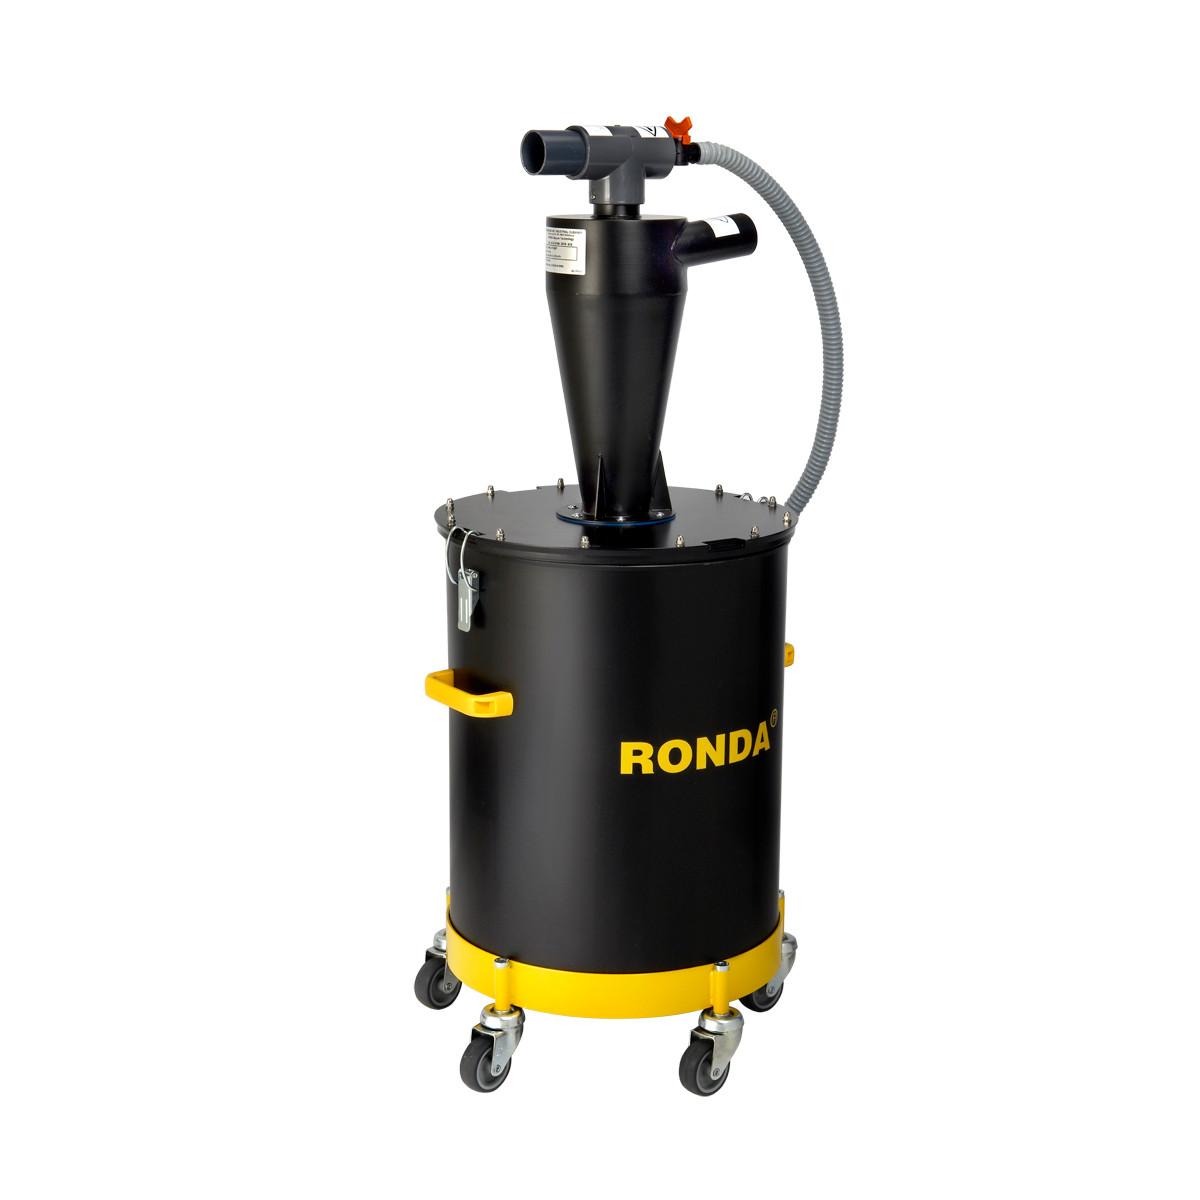 Billede af RONDA cyklonfilter CF-502P/Ø50 forudskiller